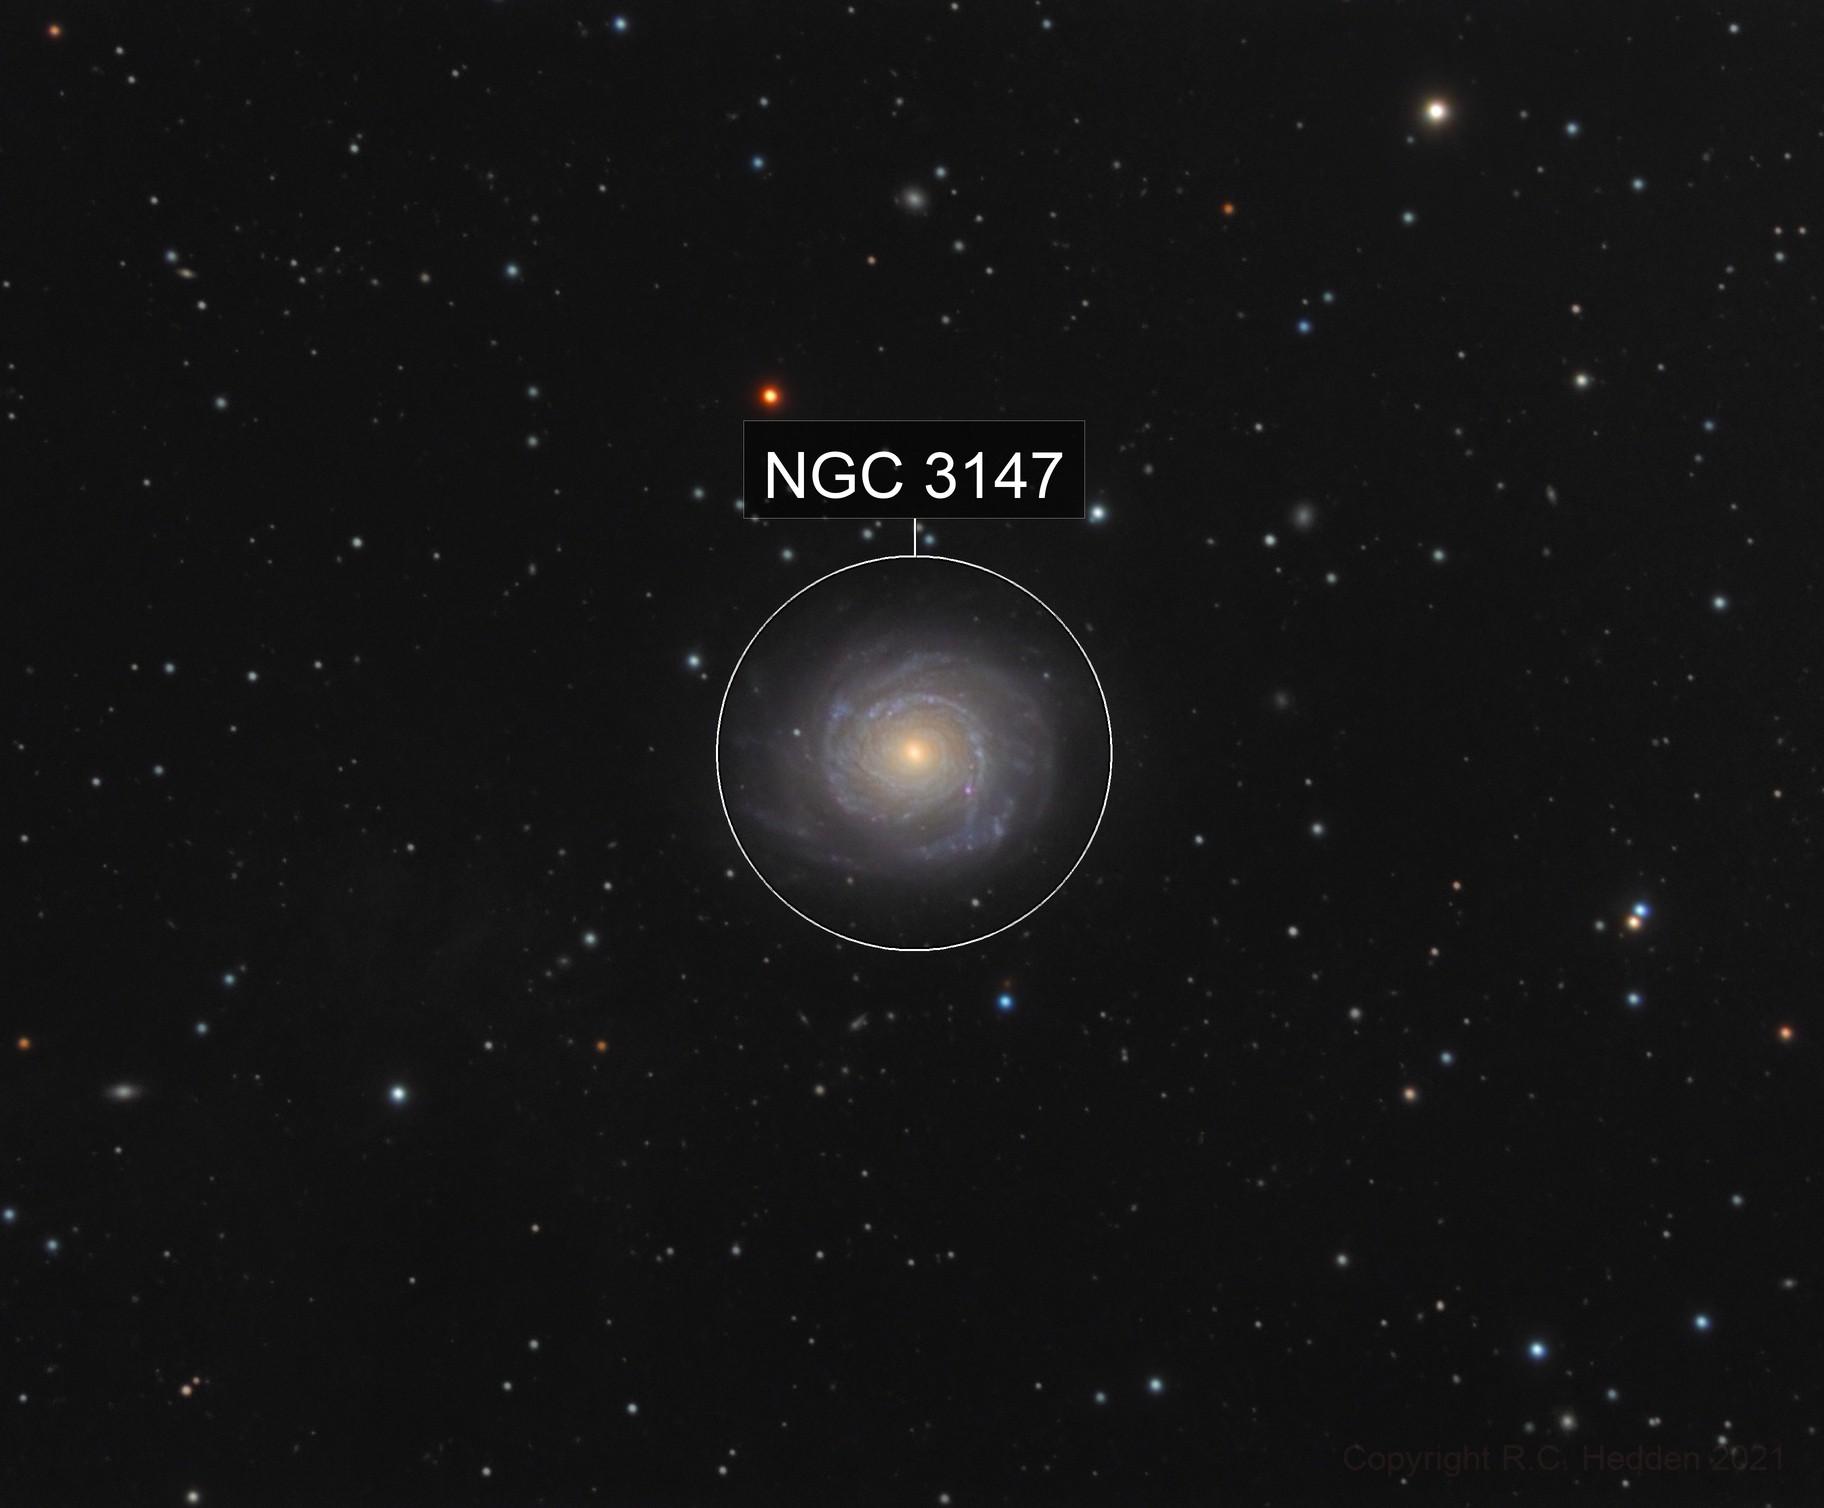 NGC 3147 and variable stars